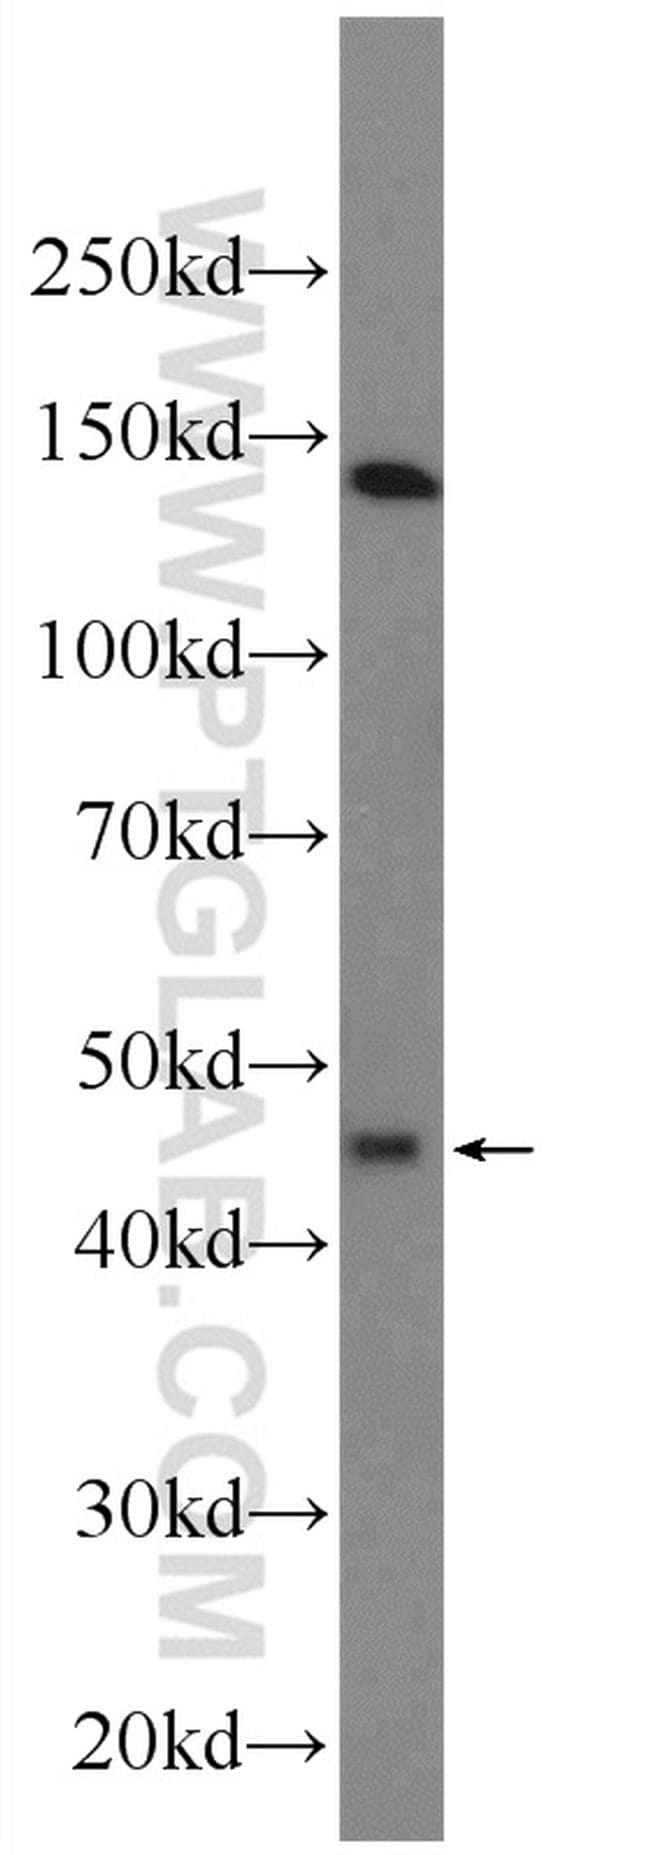 KCNK18 Antibody in Western Blot (WB)